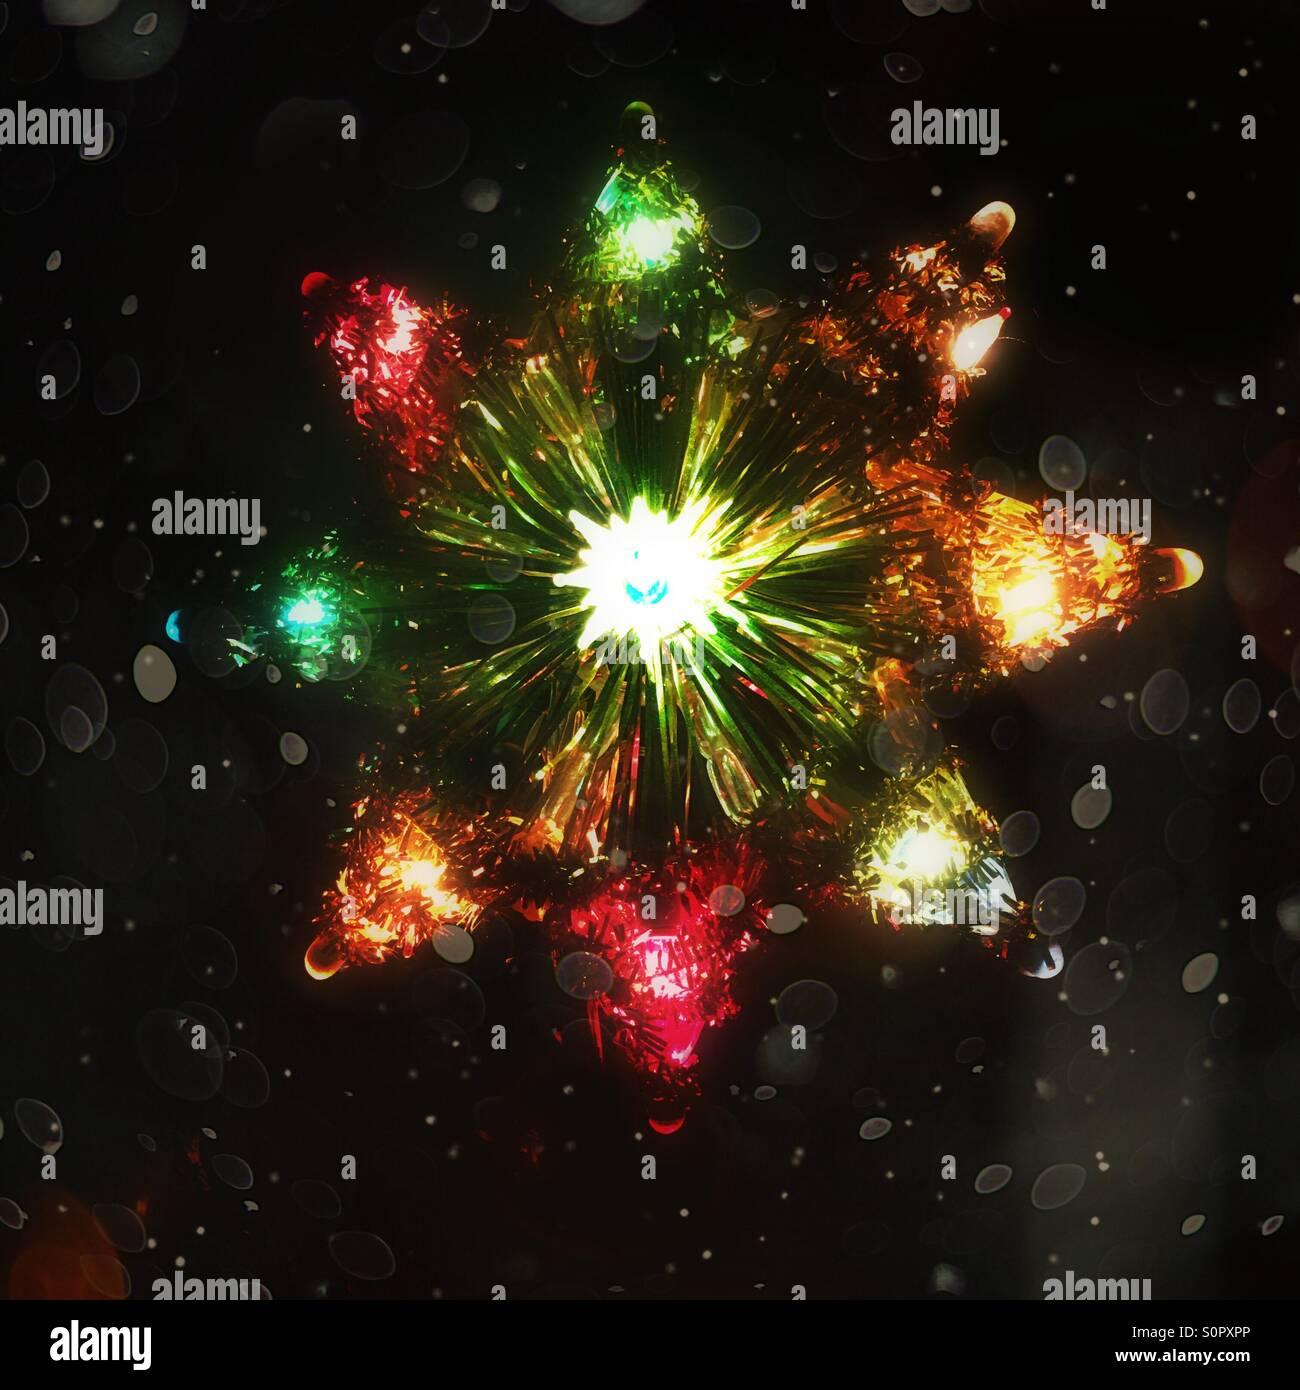 vintage star christmas tree topper stock image - Vintage Christmas Tree Toppers